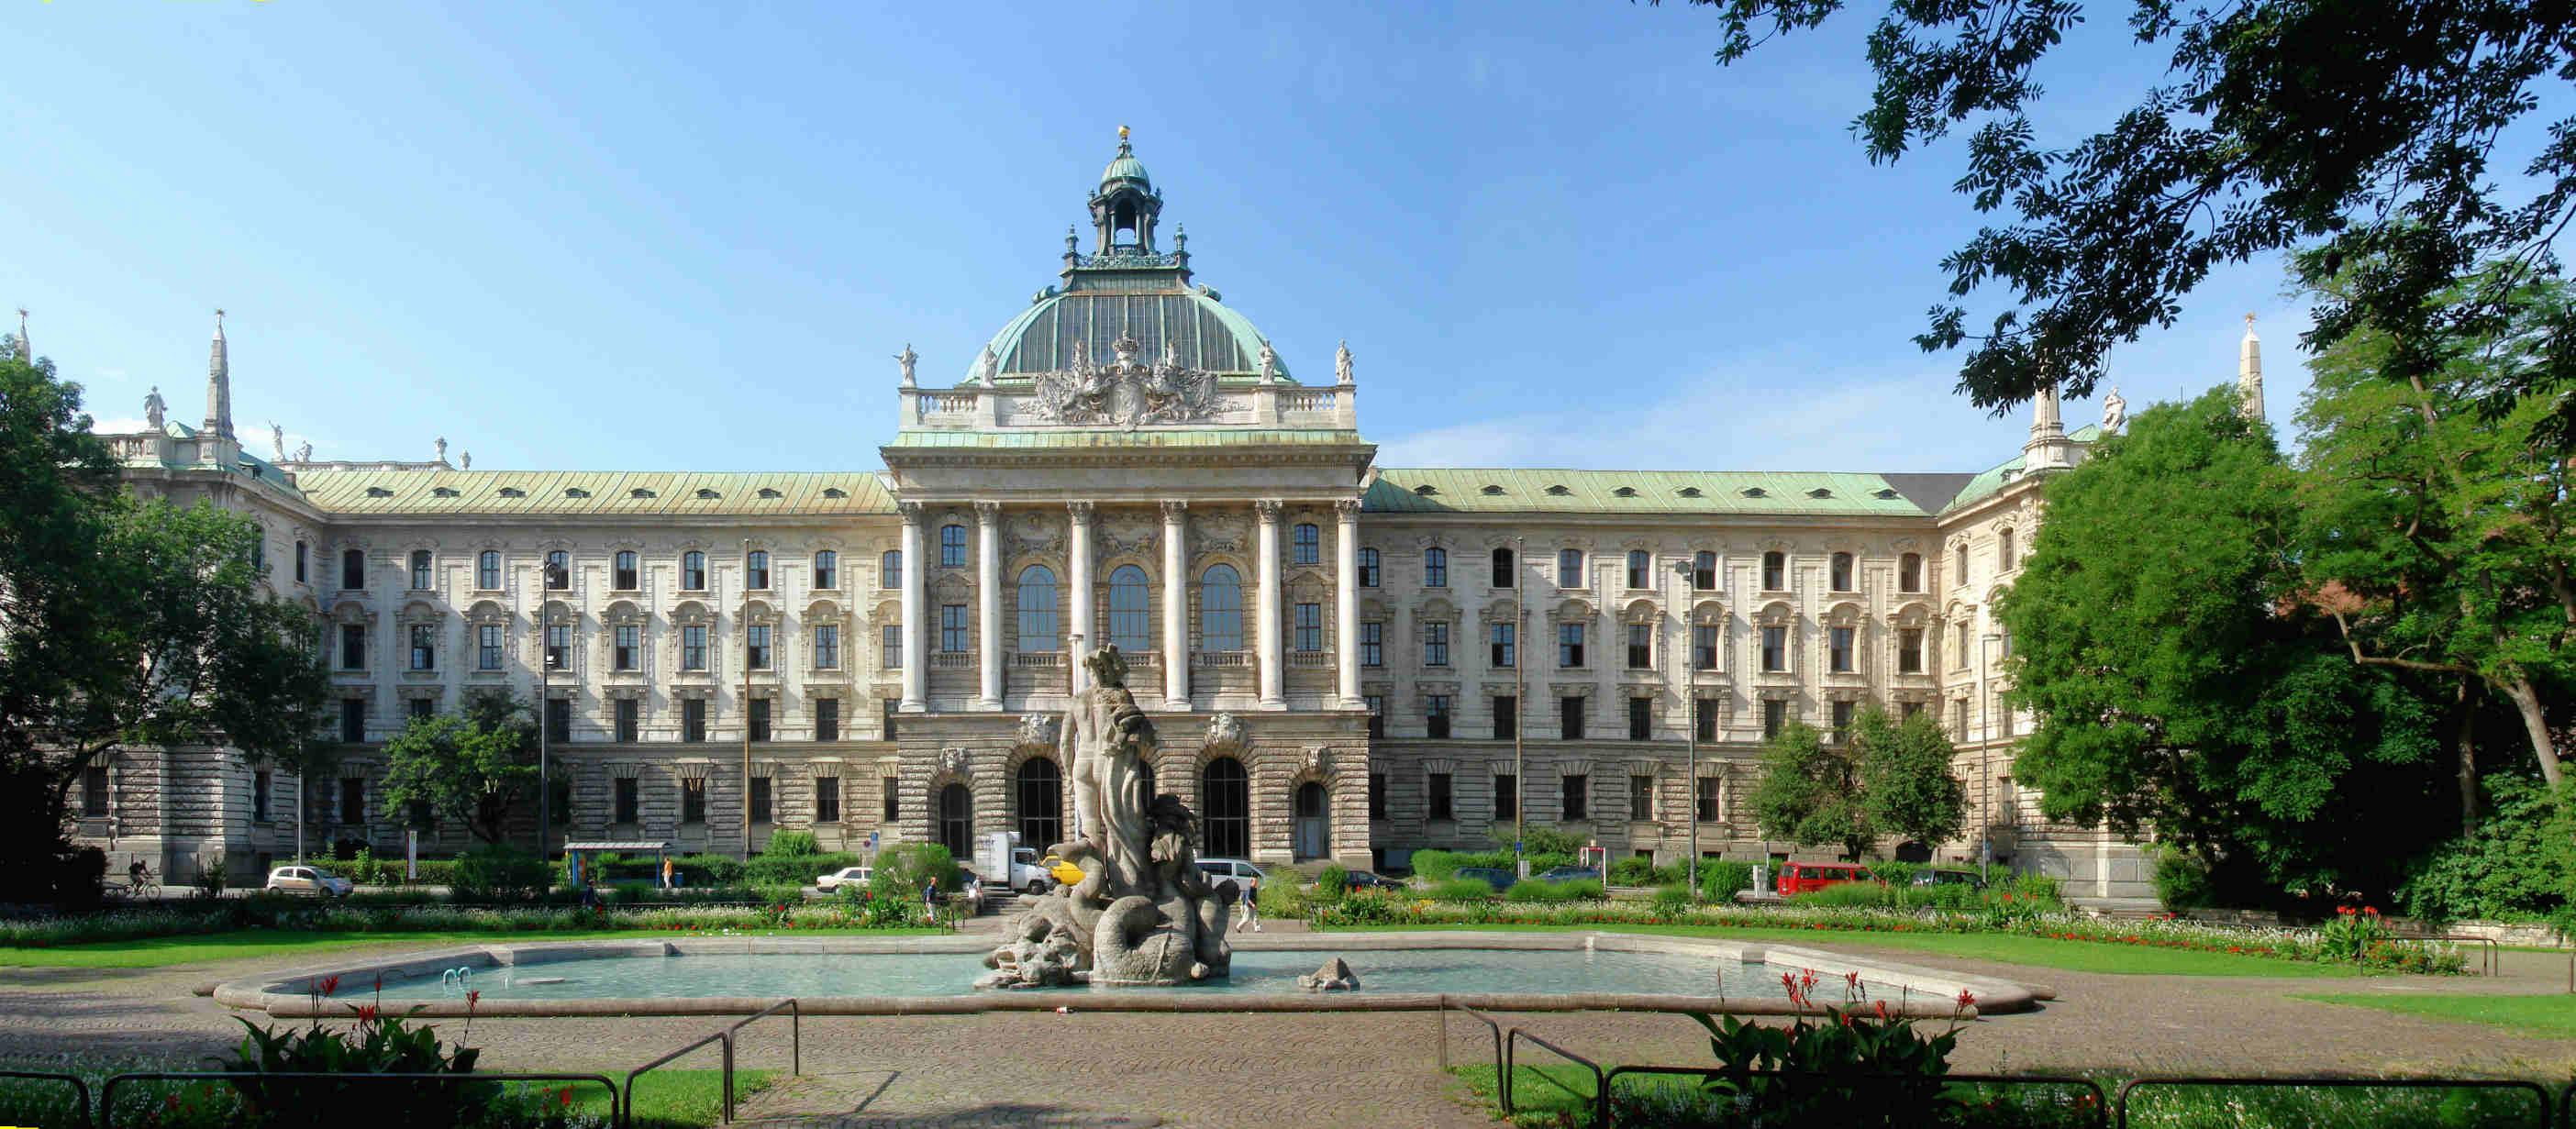 Justizpalast (München) | Mapio.net